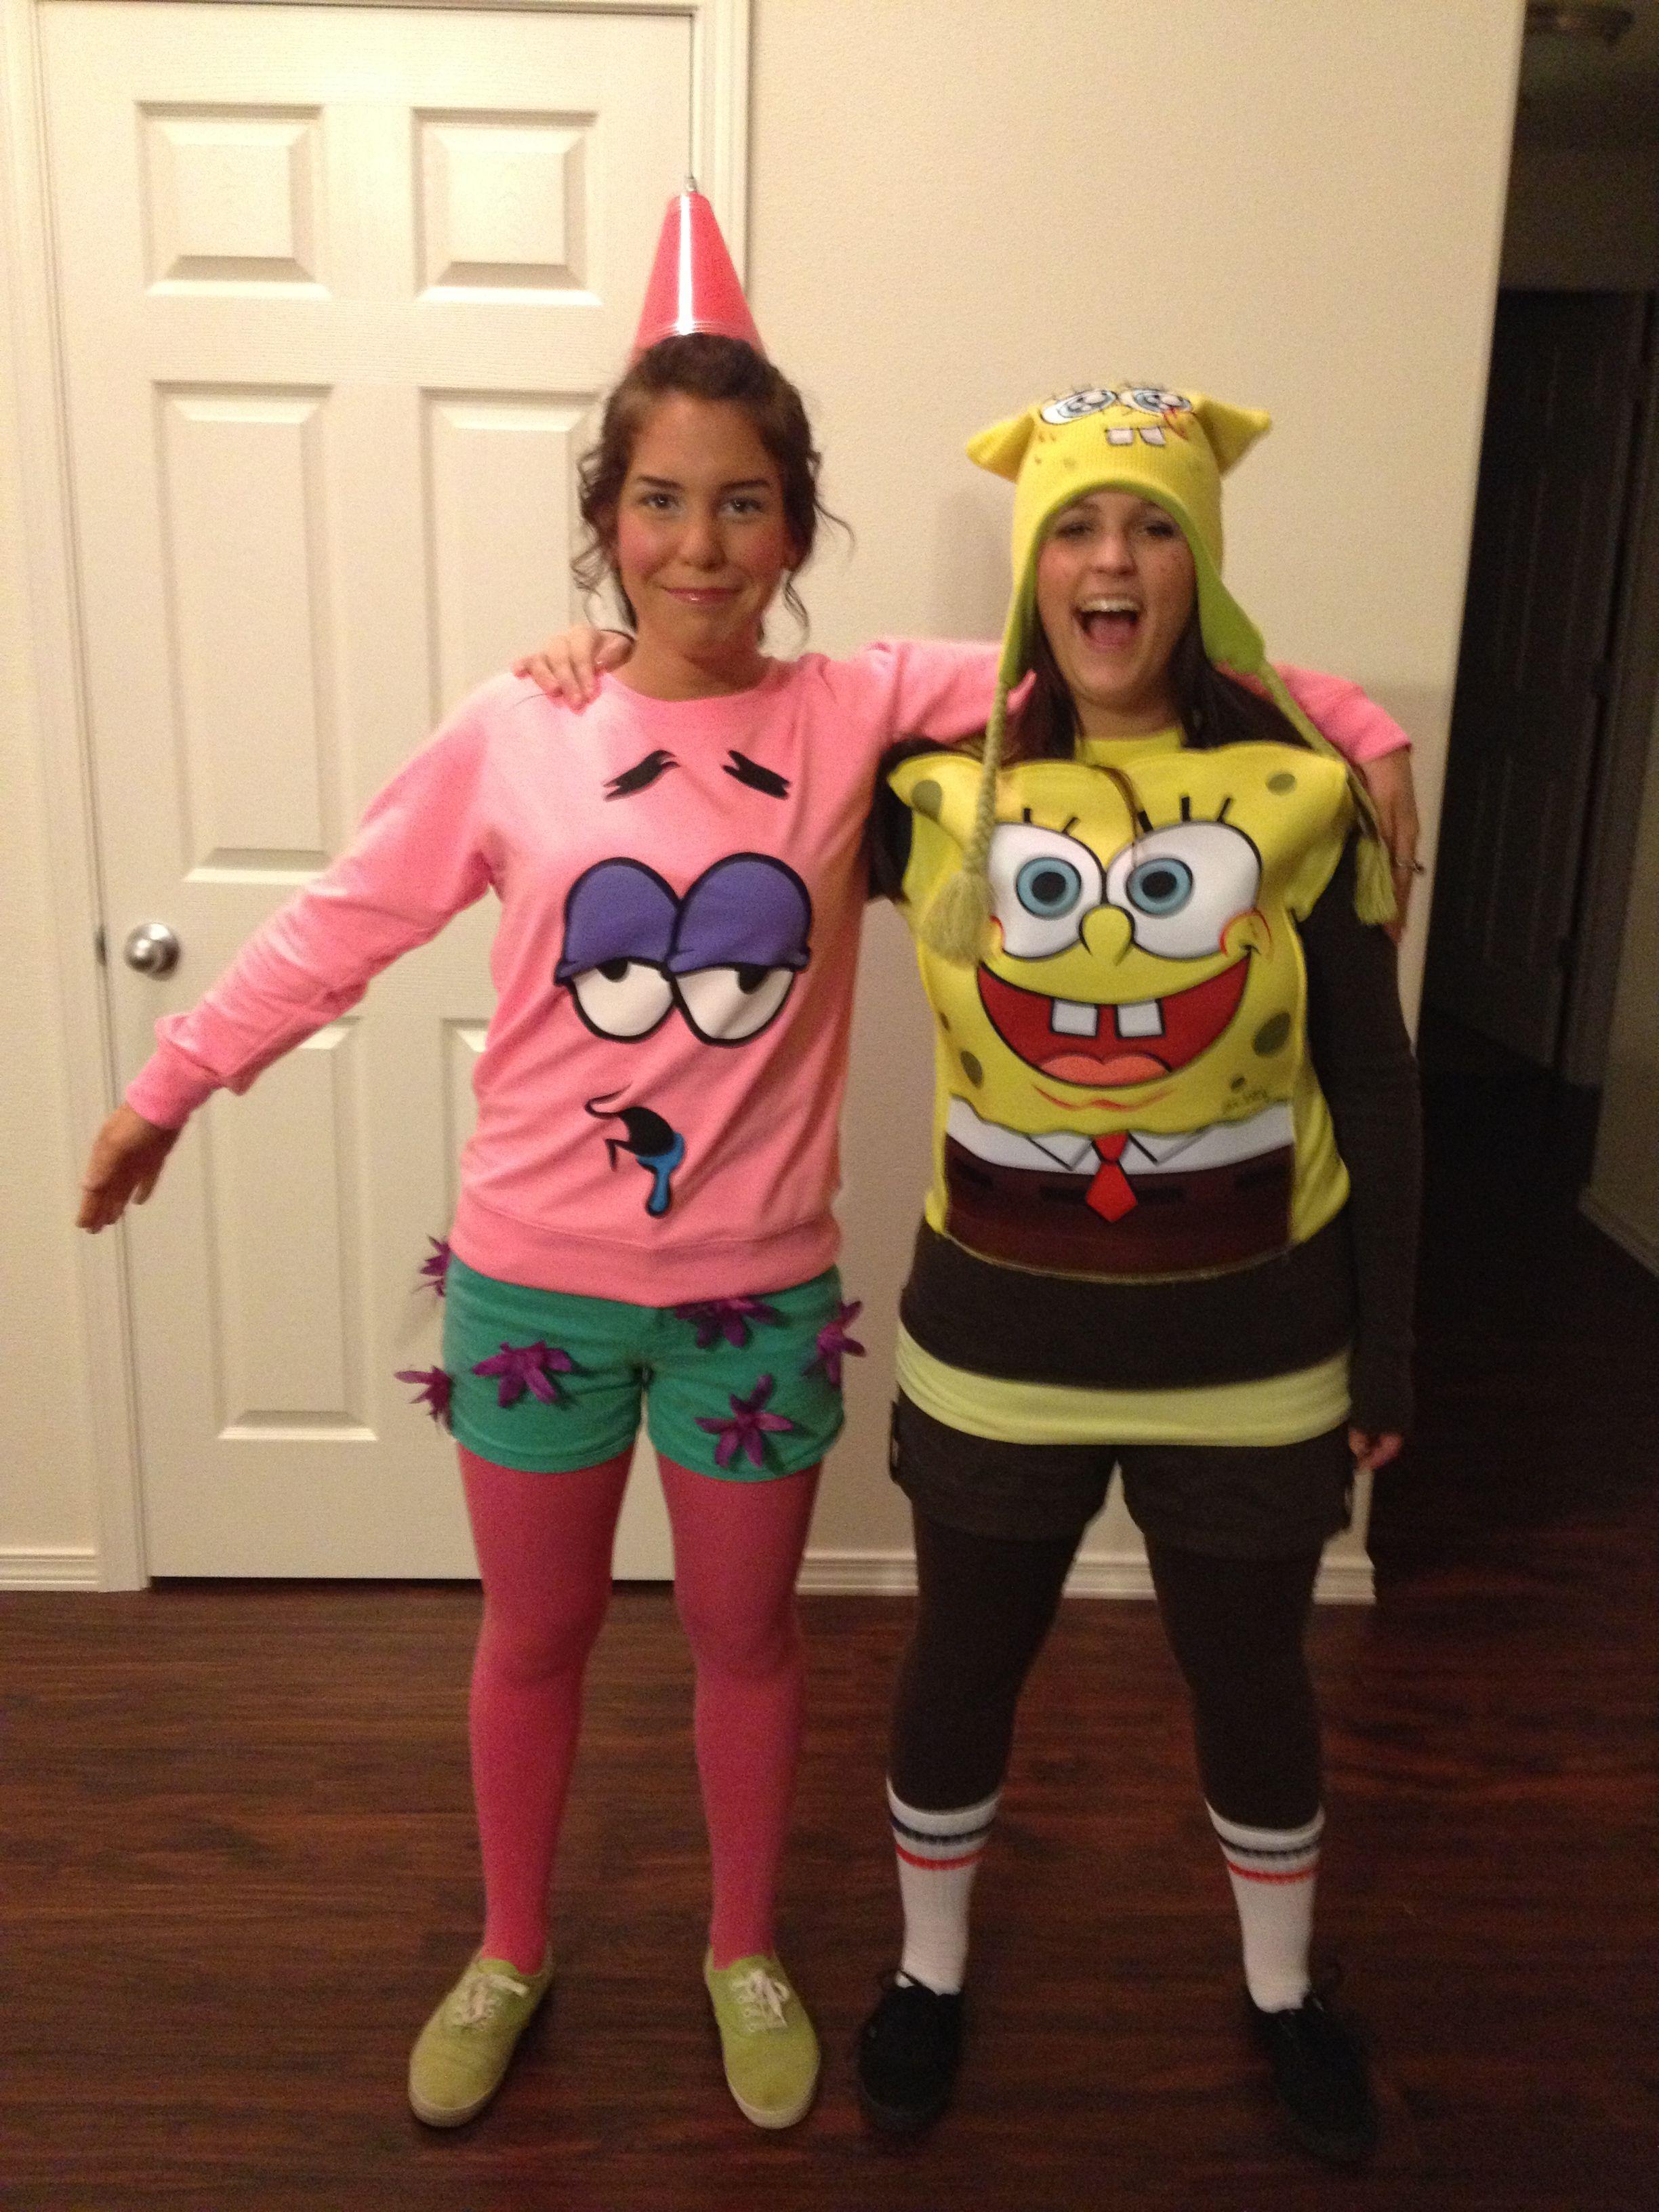 spongebob and patrick costume #halloween #costume #spoton   my style